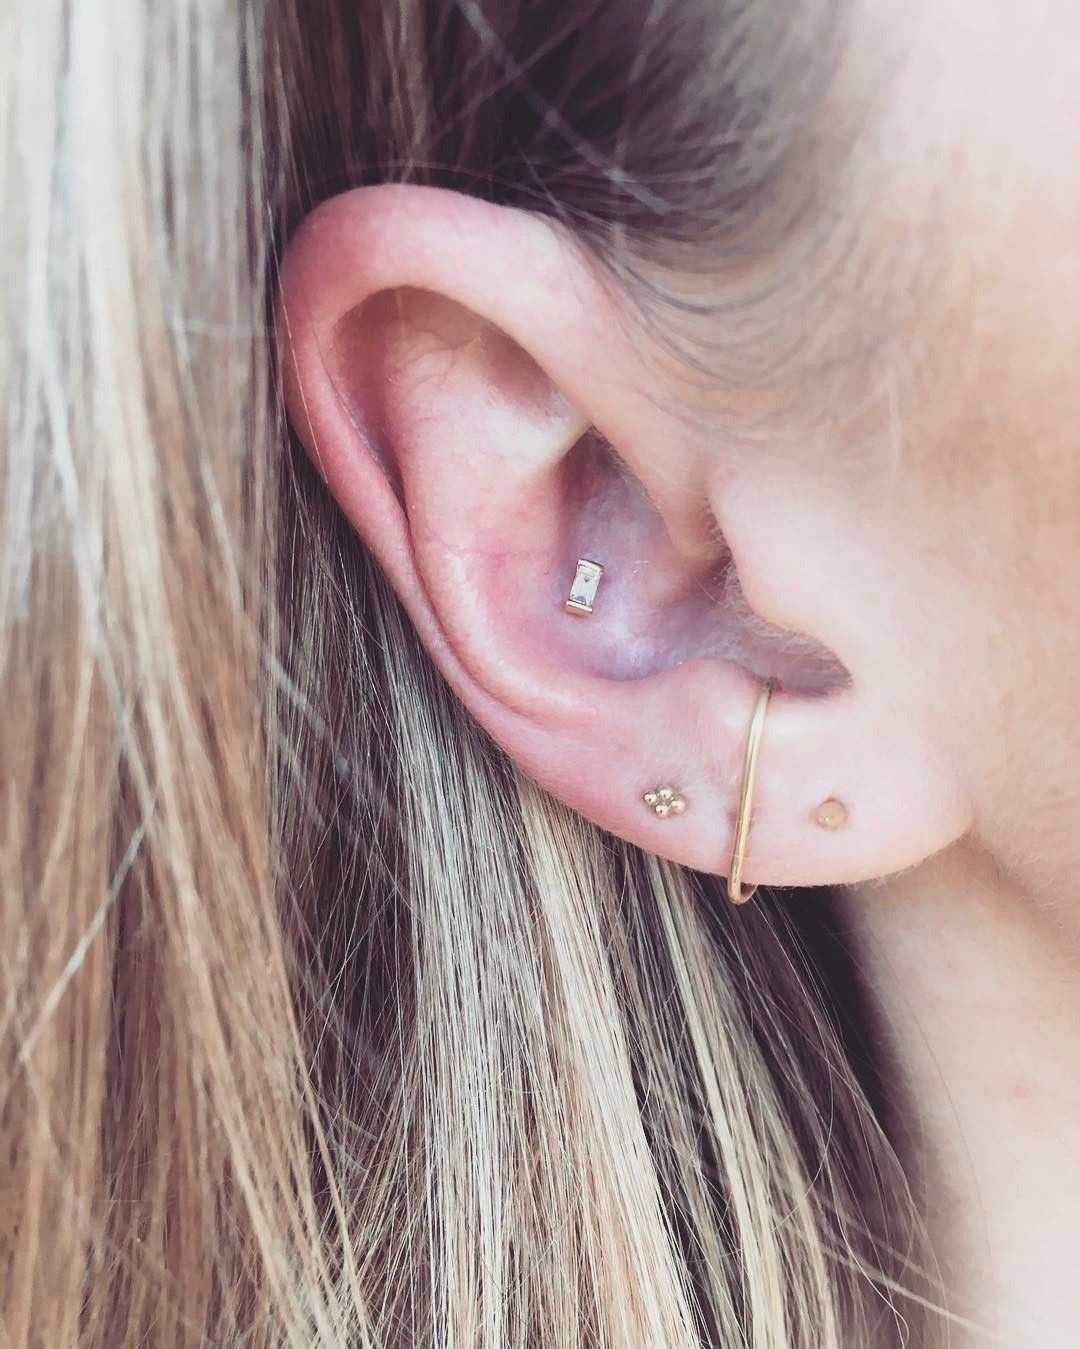 2879adaab 2017 Piercing Trends Brian Keith Thompson LA Minimalist | Jewelry ...